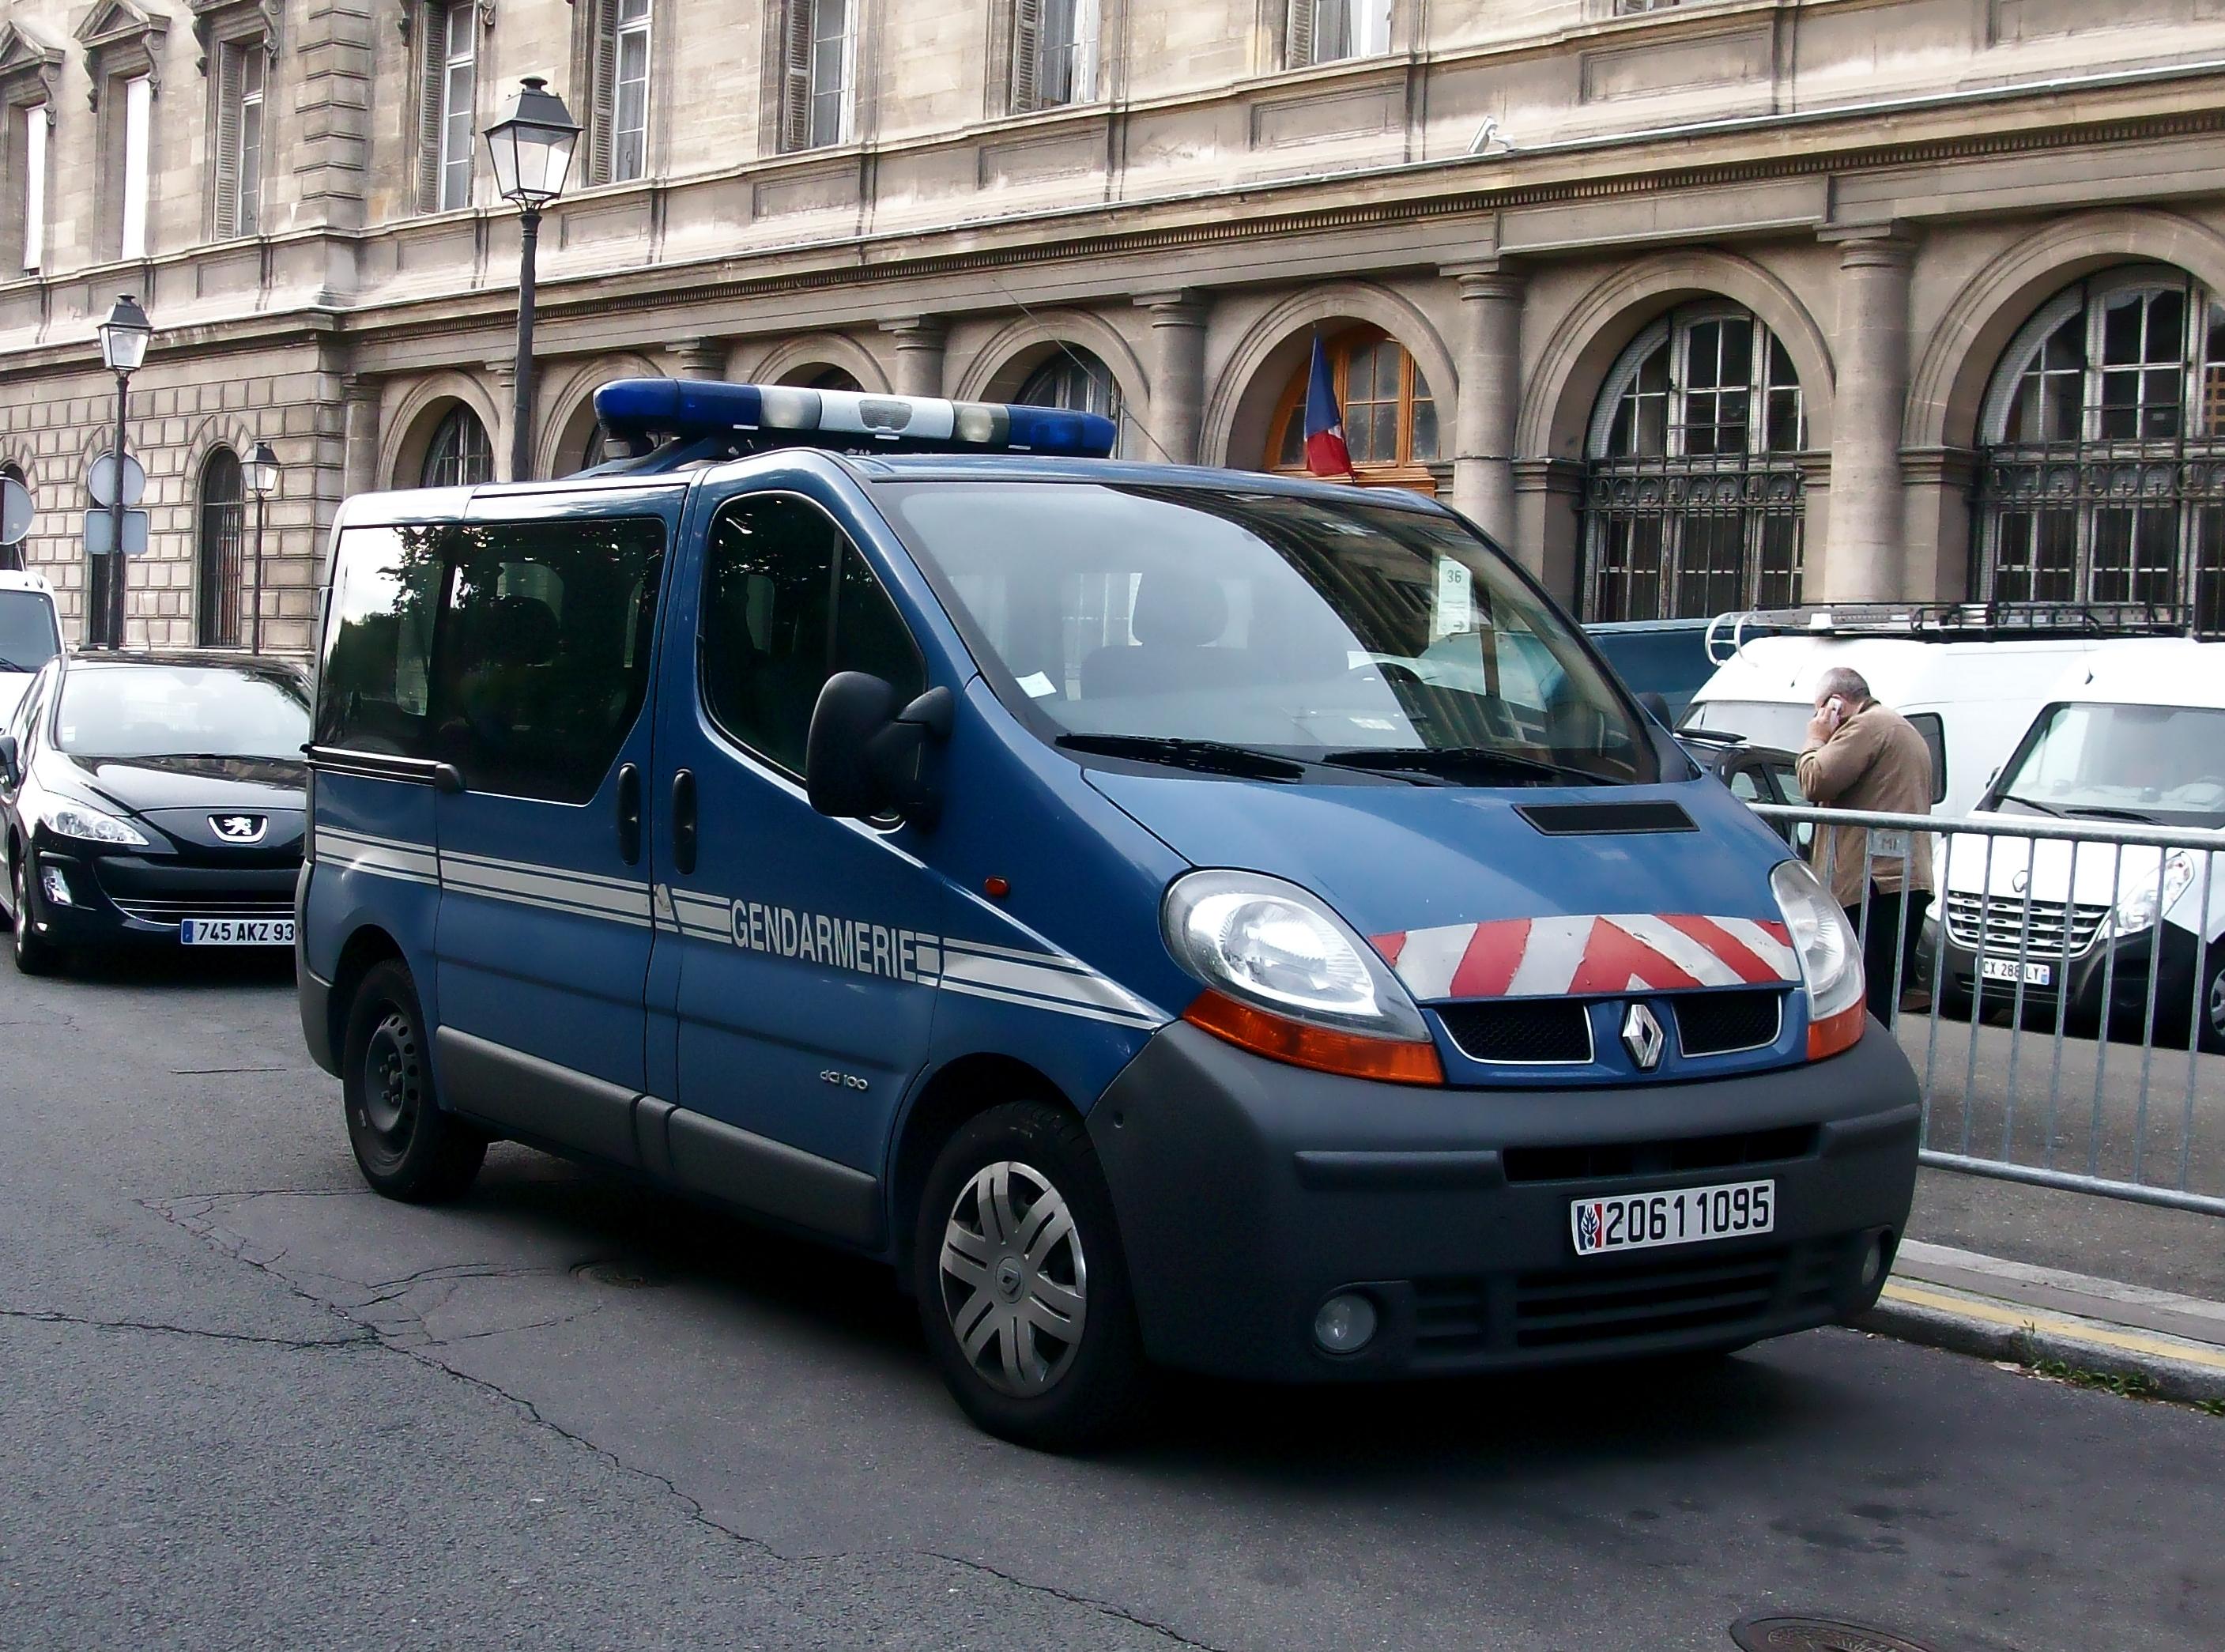 file renault trafic gendarmerie nationale  septembre 2013 paris jpg